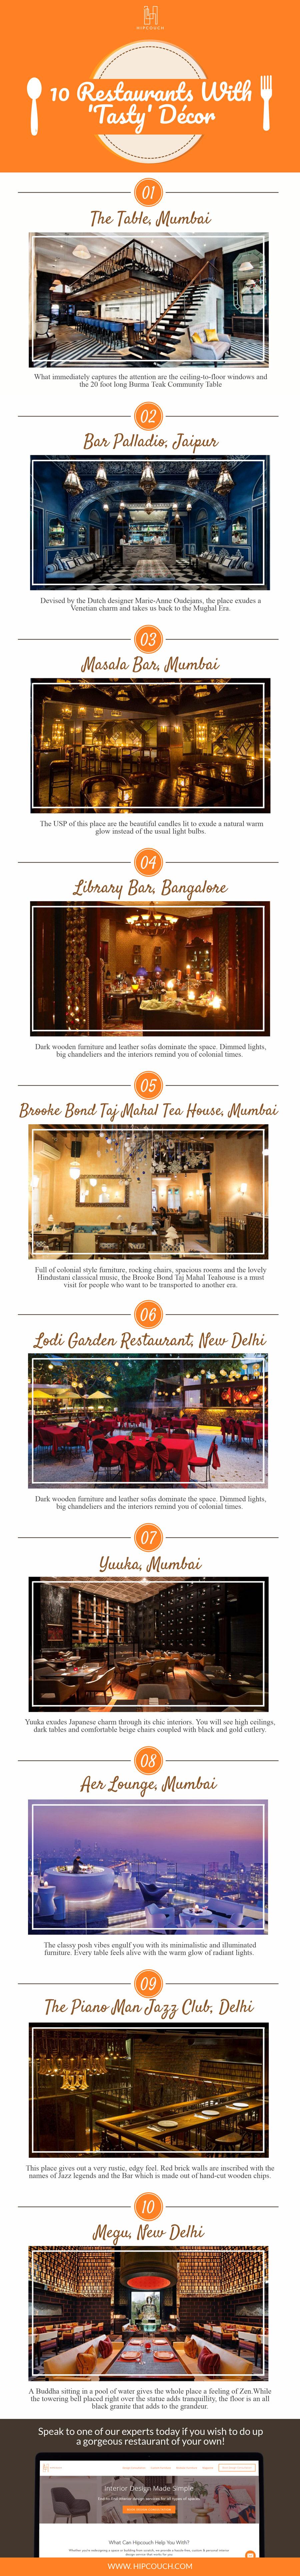 10-restaurants-with-tasty-interiors.jpg